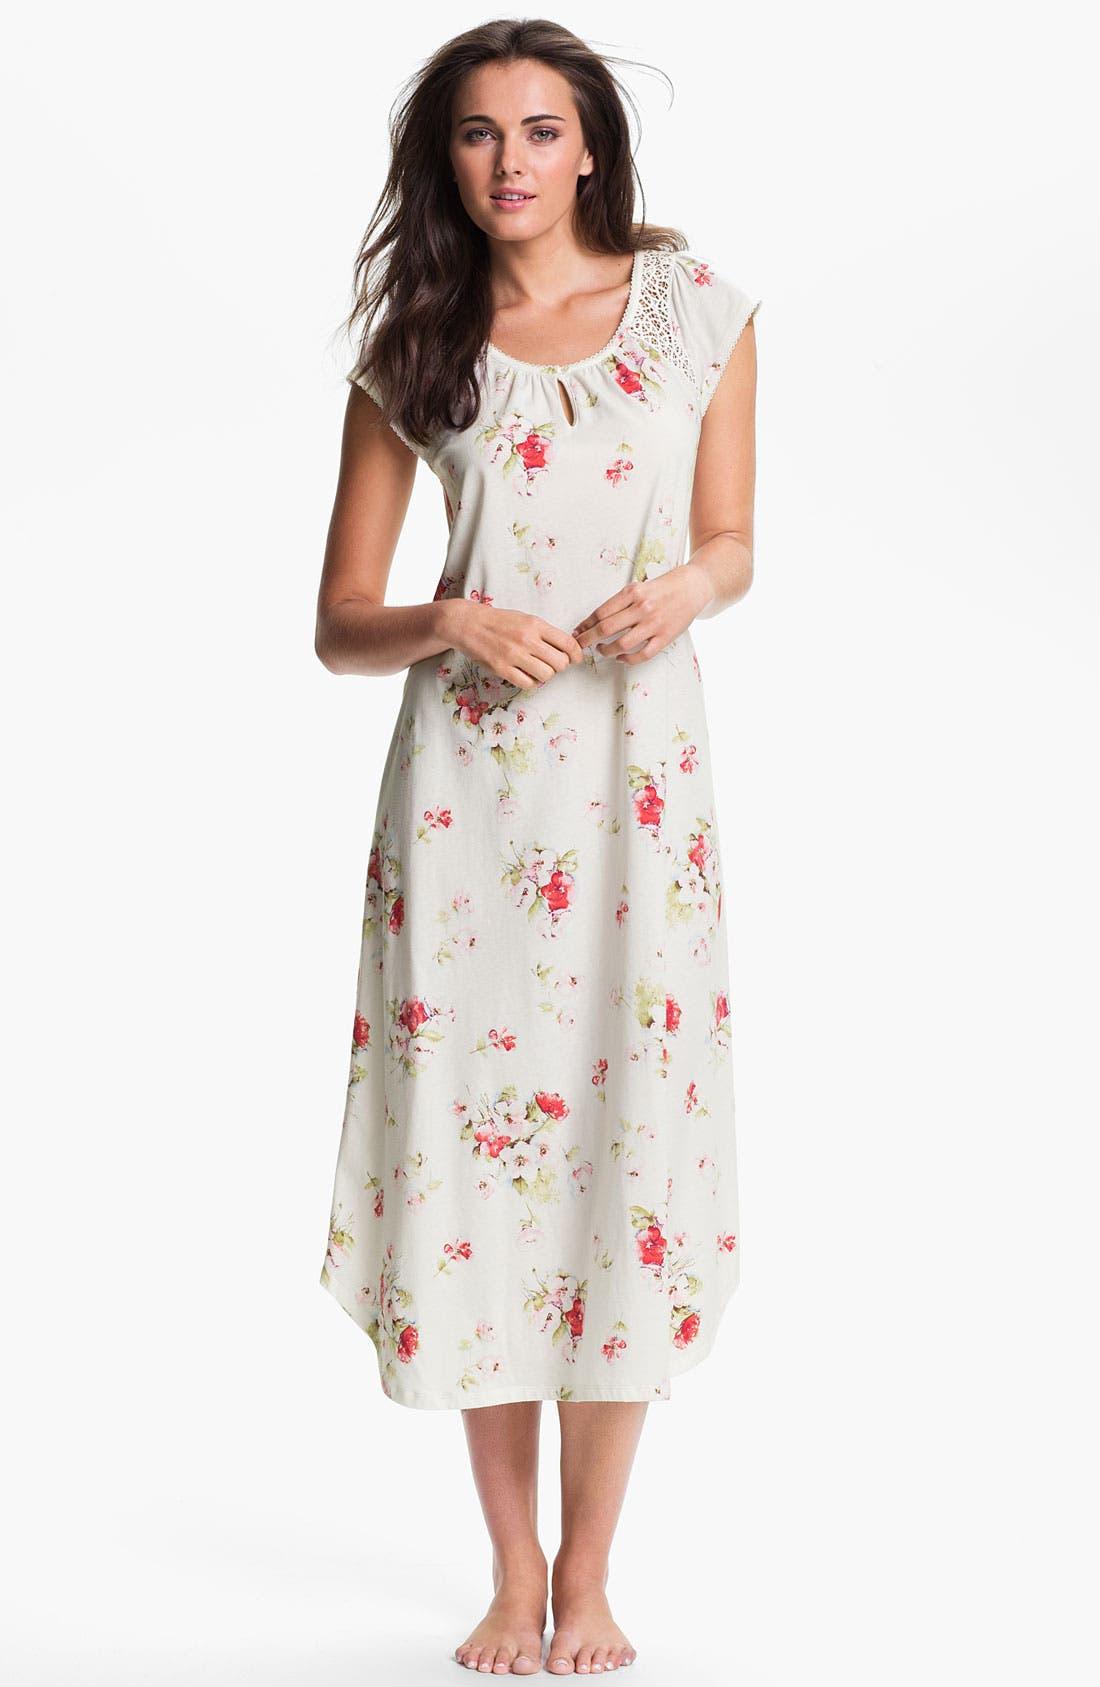 Alternate Image 1 Selected - Carole Hochman Designs 'Roseberry Amaryllis' Nightgown